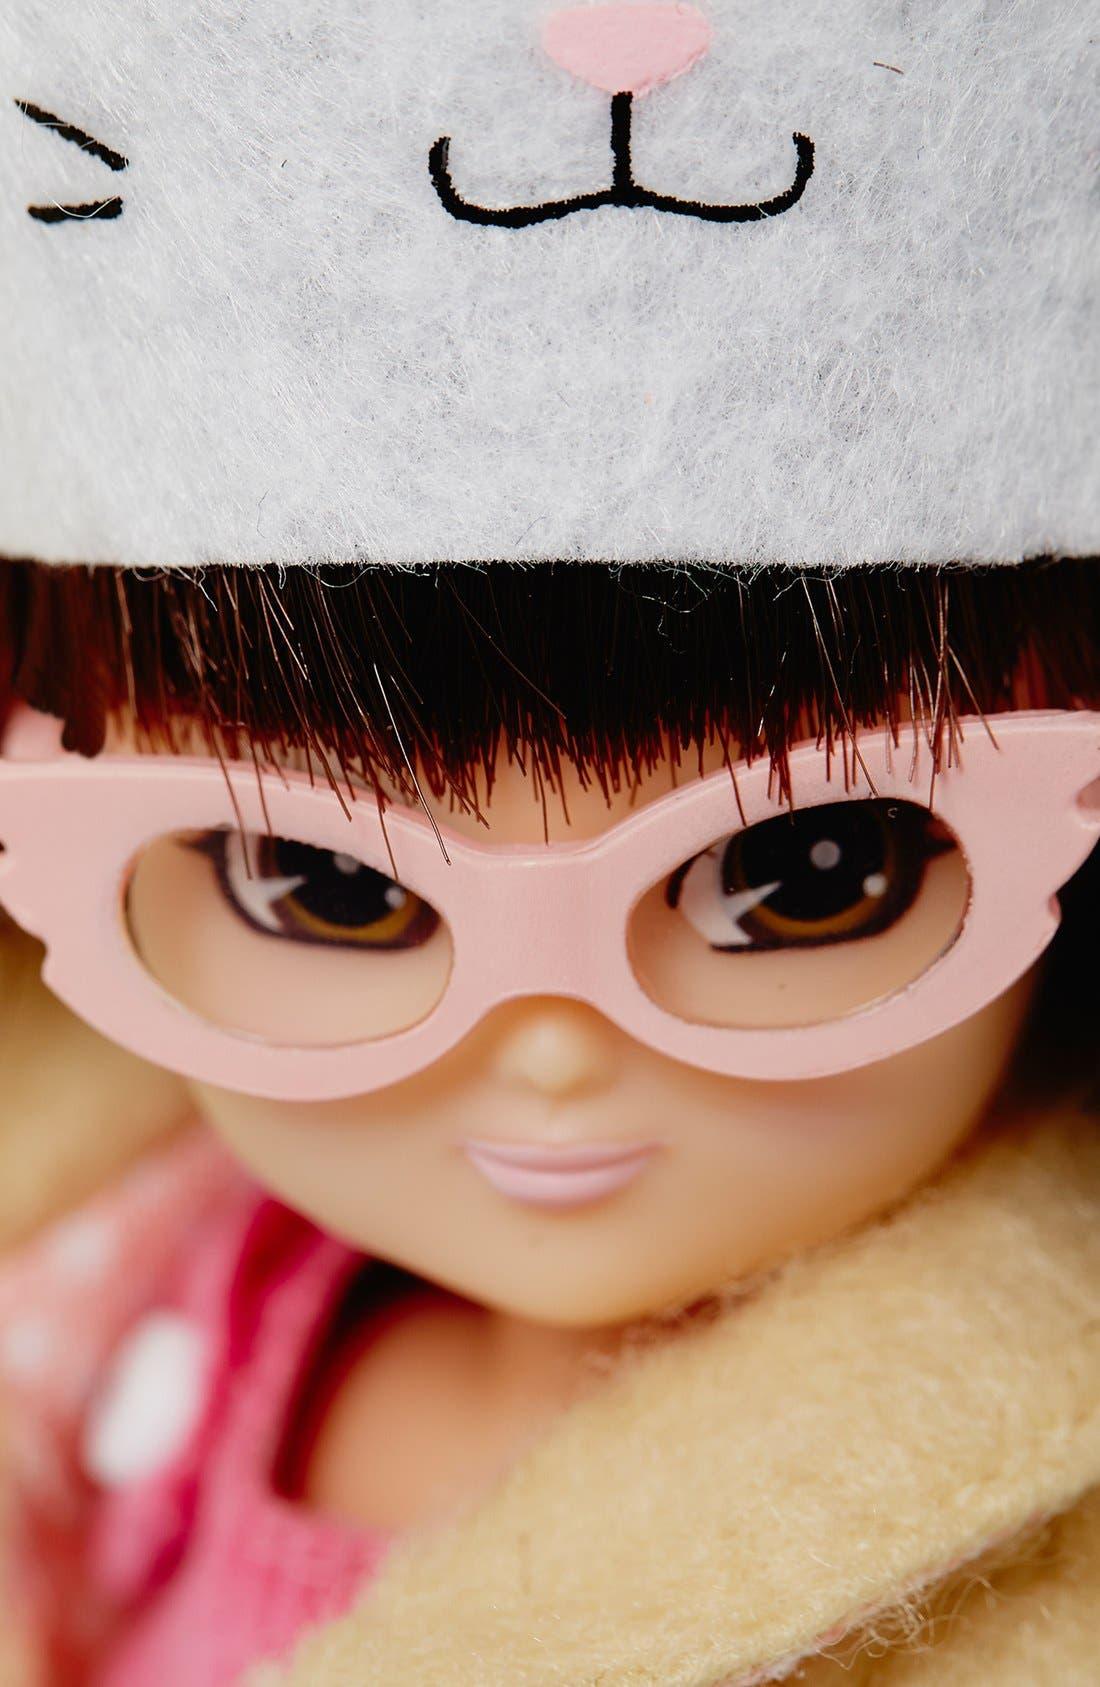 Alternate Image 3  - Schylling 'Lottie™ - Pandora's Box' Doll